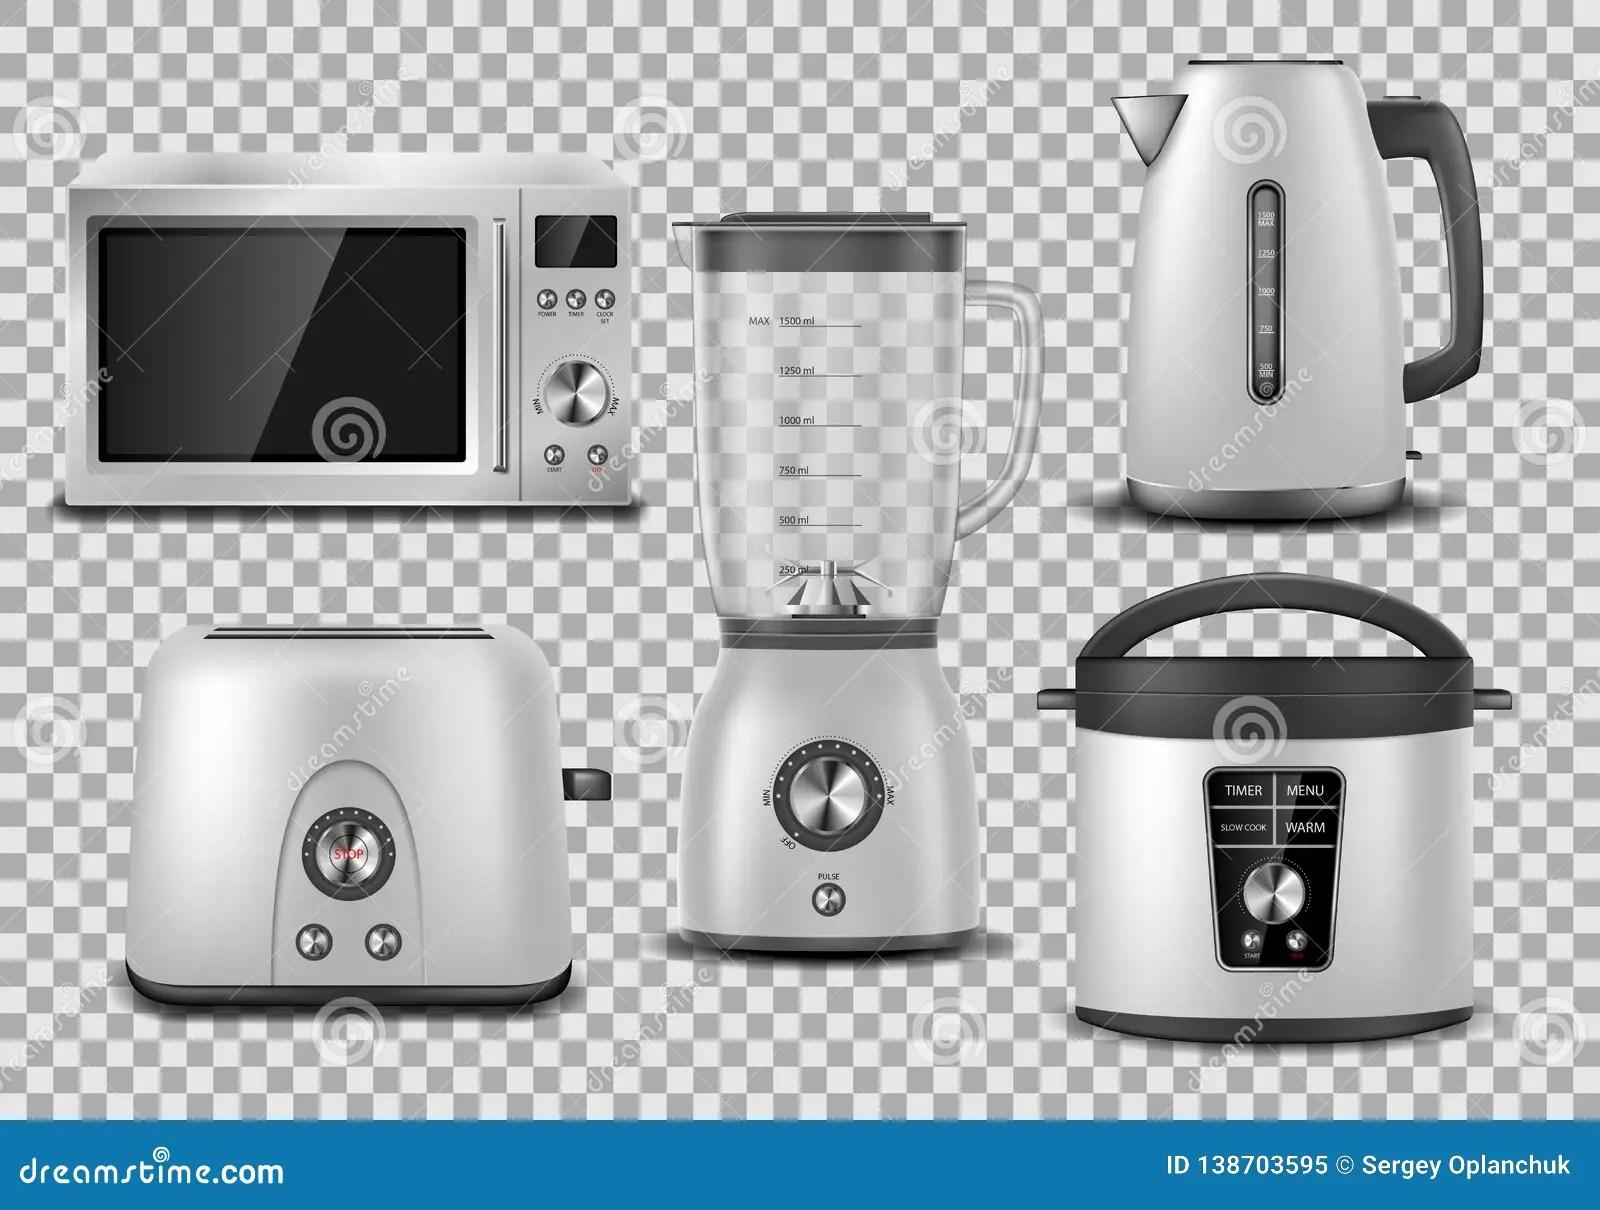 https www dreamstime com kitchen appliances realistic microwave kettle blender oven juicer toaster multicooker silver mockup set household appliance image138703595